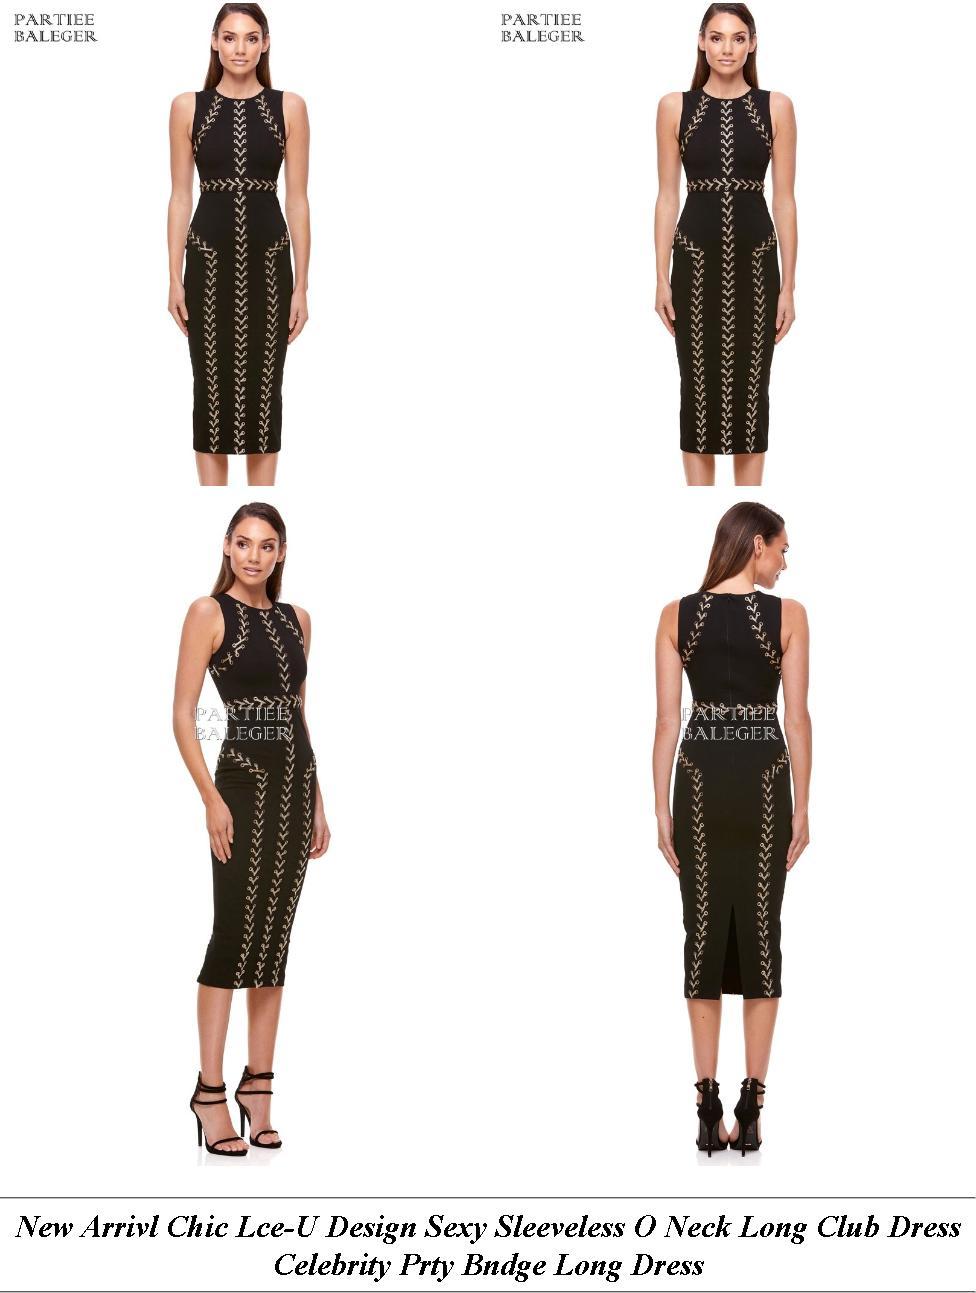 Plus Size Maxi Dresses - Online Sale Offers - Yellow Dress - Buy Cheap Clothes Online